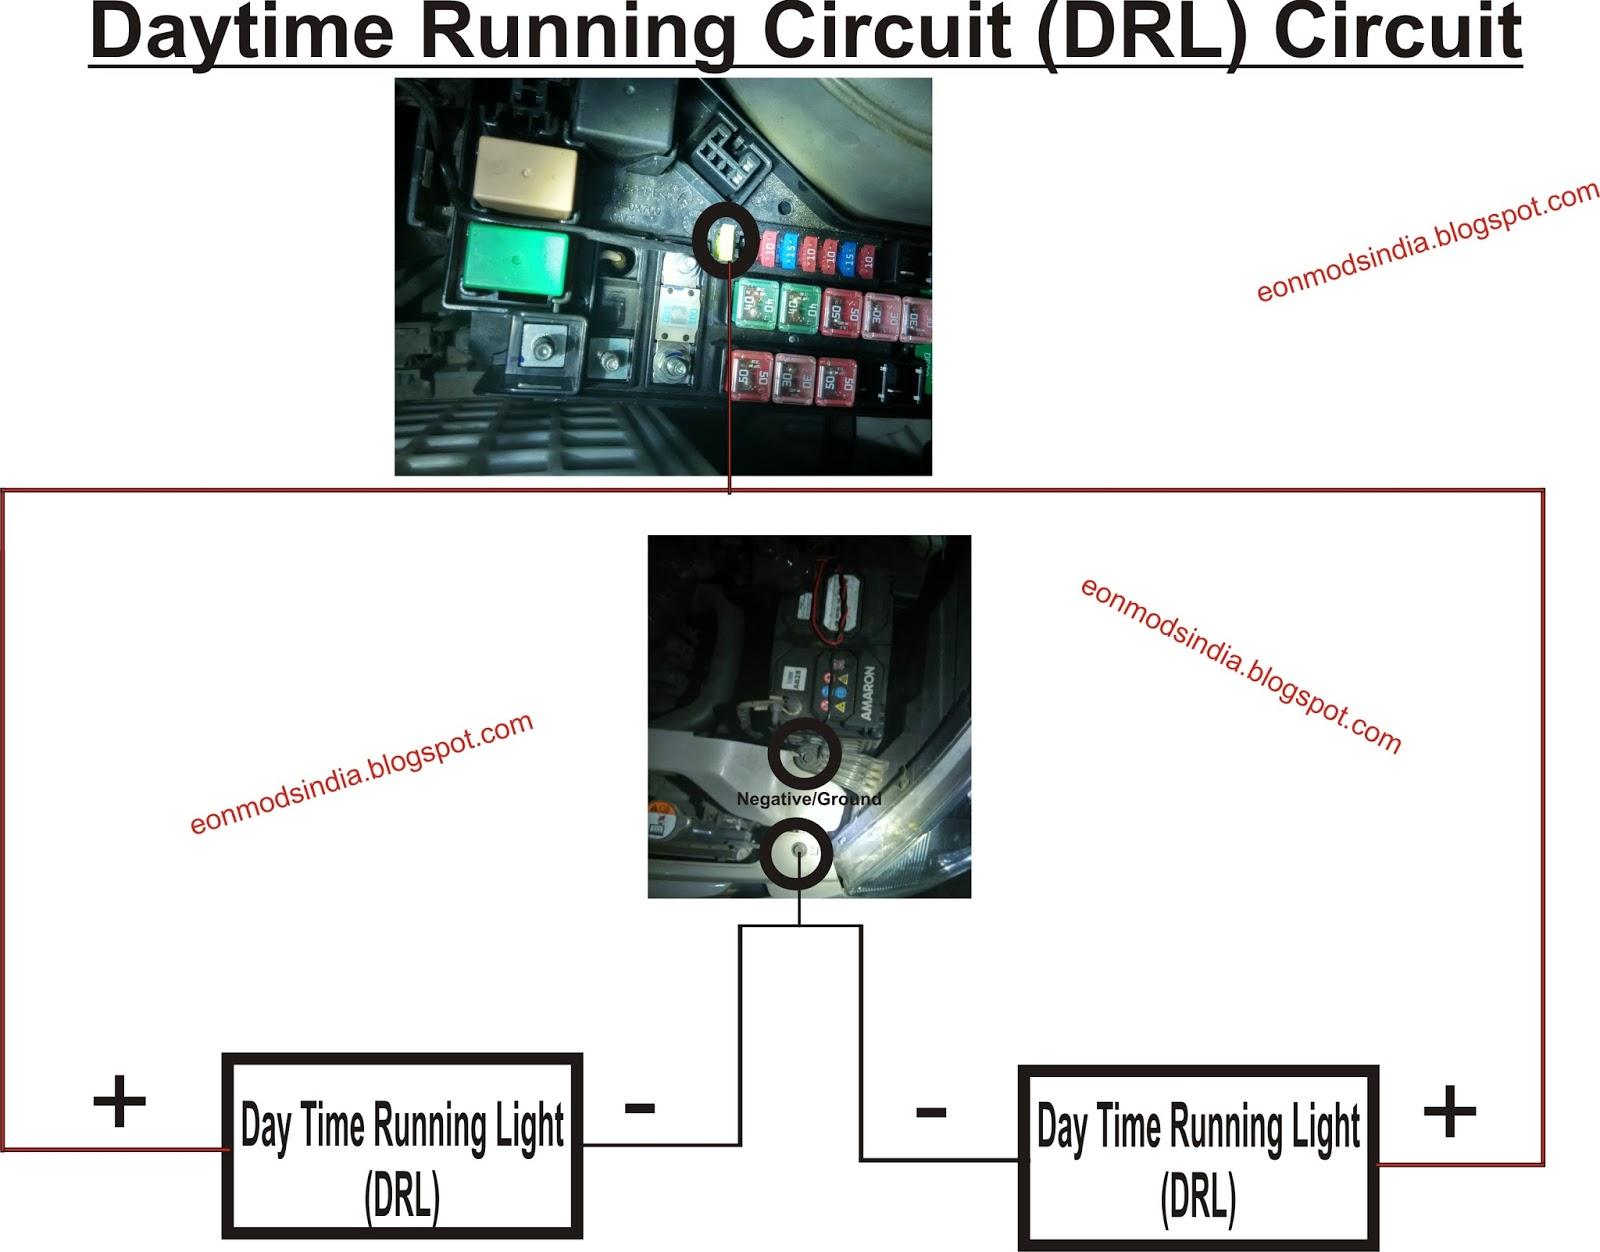 medium resolution of drl circuit